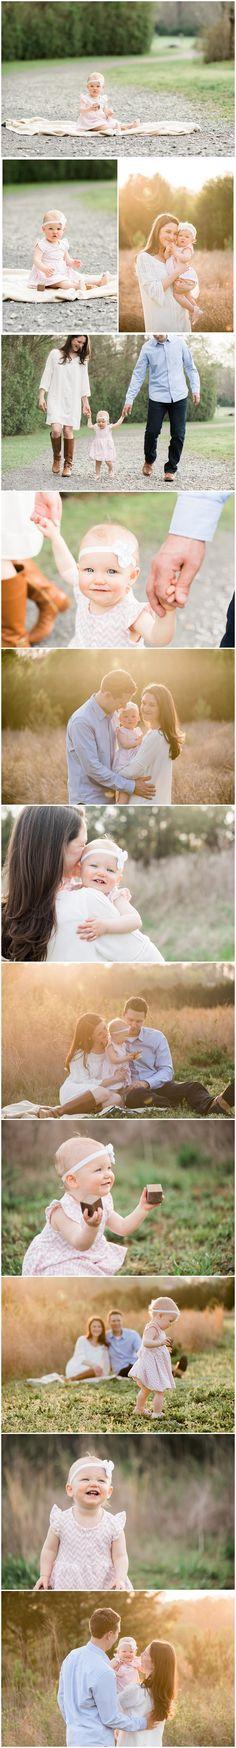 Heather Carraway Photography | atlanta baby photographer, atlanta baby and family photographer, one year old photo session in atlanta